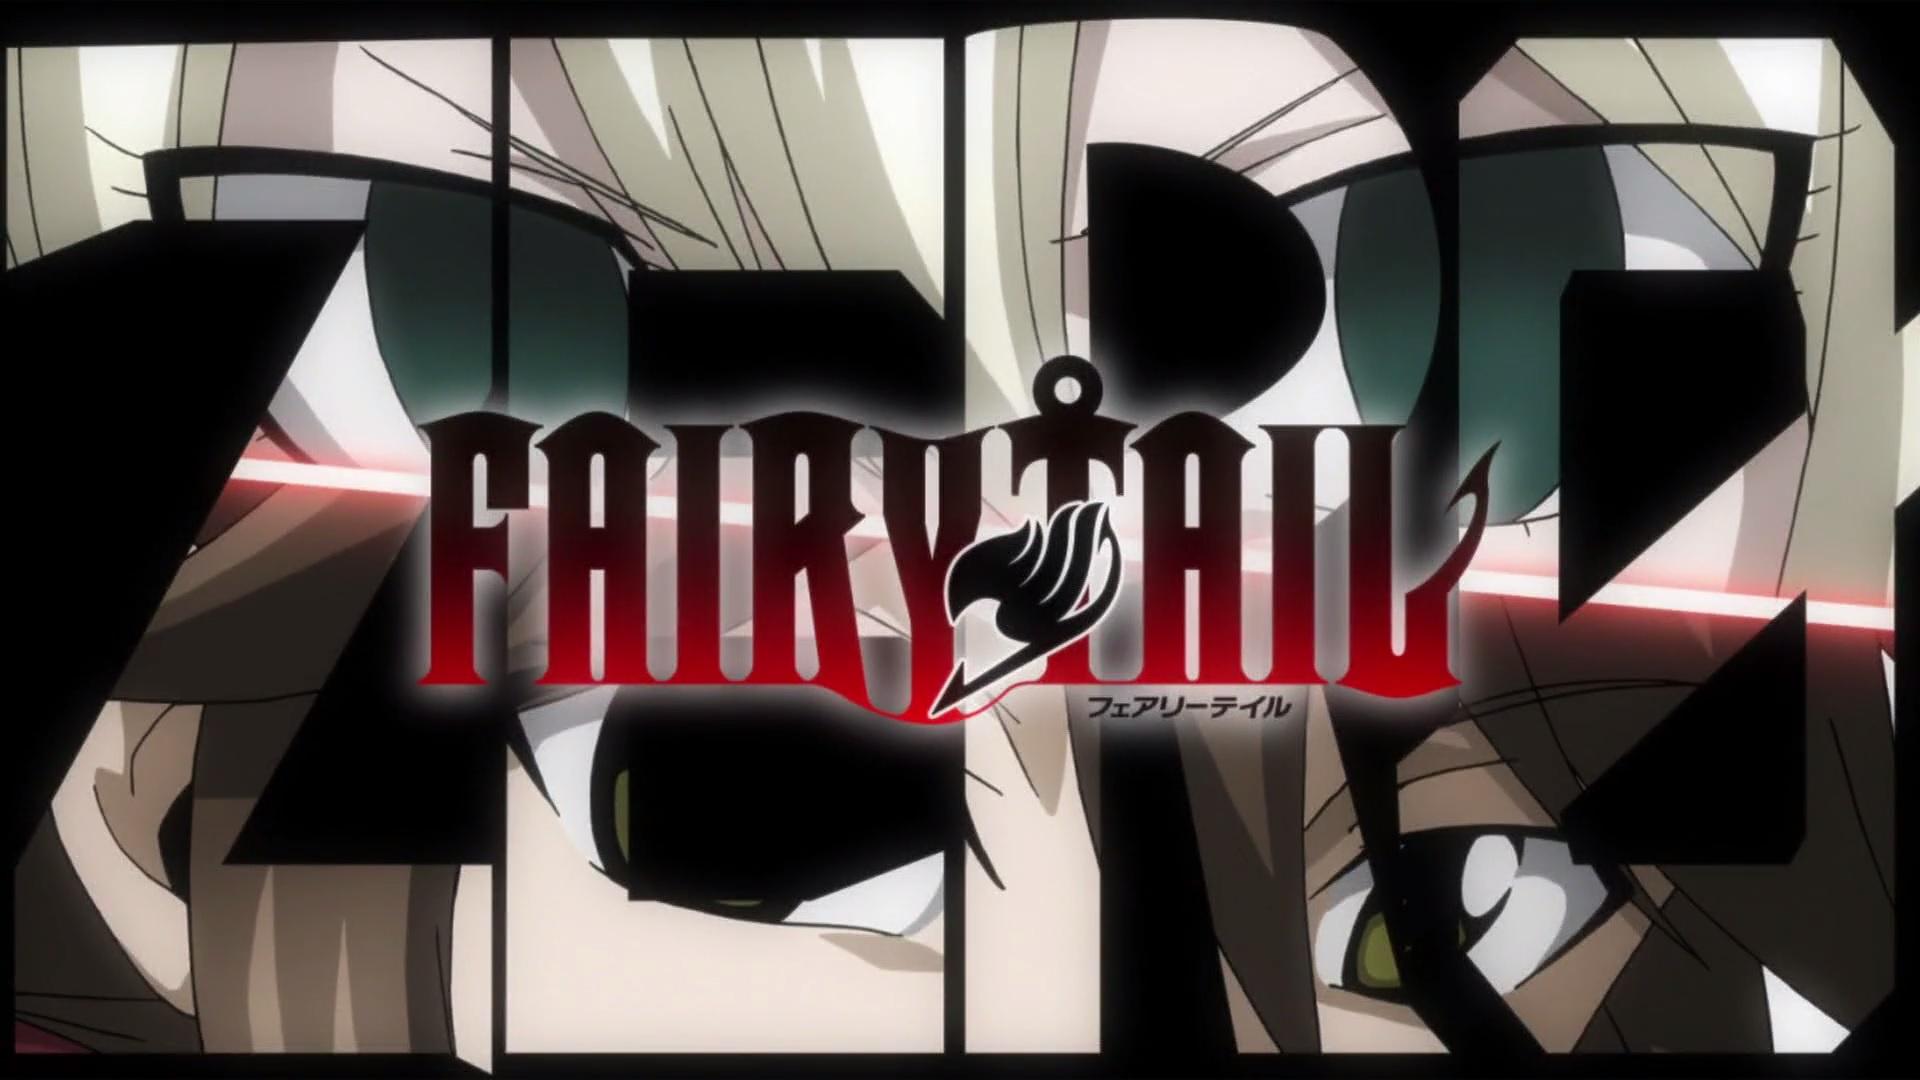 Natsu Dragneel Wallpaper 3d Fairy Tail Zero Mavis Journey Fairy Tail 266 Daily